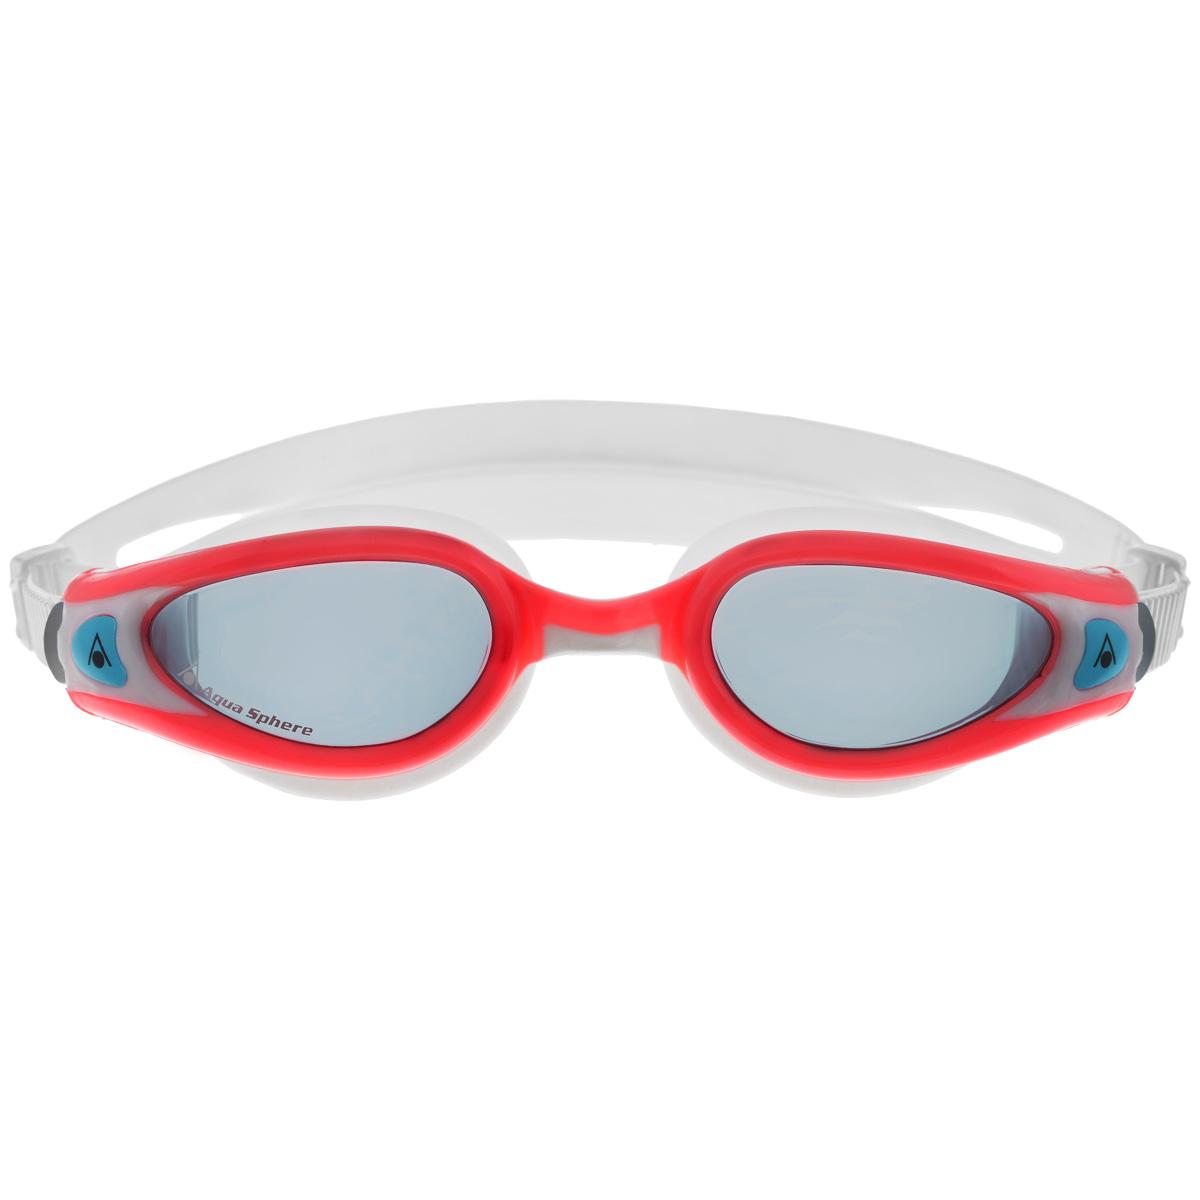 Очки для плавания Aqua Sphere Kaiman Exo Lady, цвет: белый, розовый очки для плавания aqua sphere k180 lady цвет белый розовый